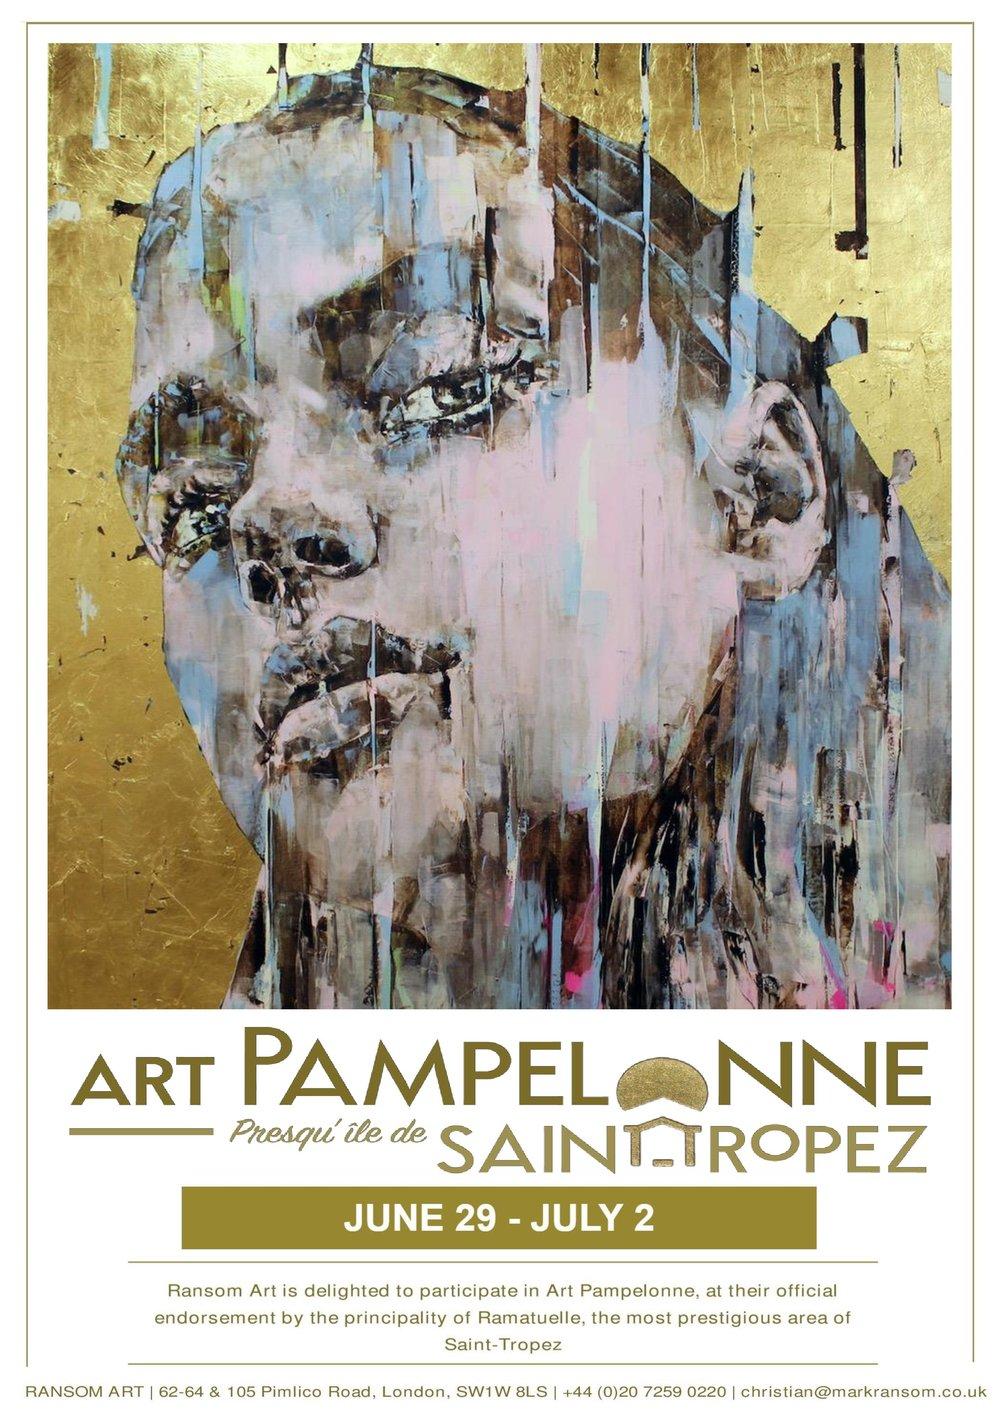 Art Pampelonne Invitation